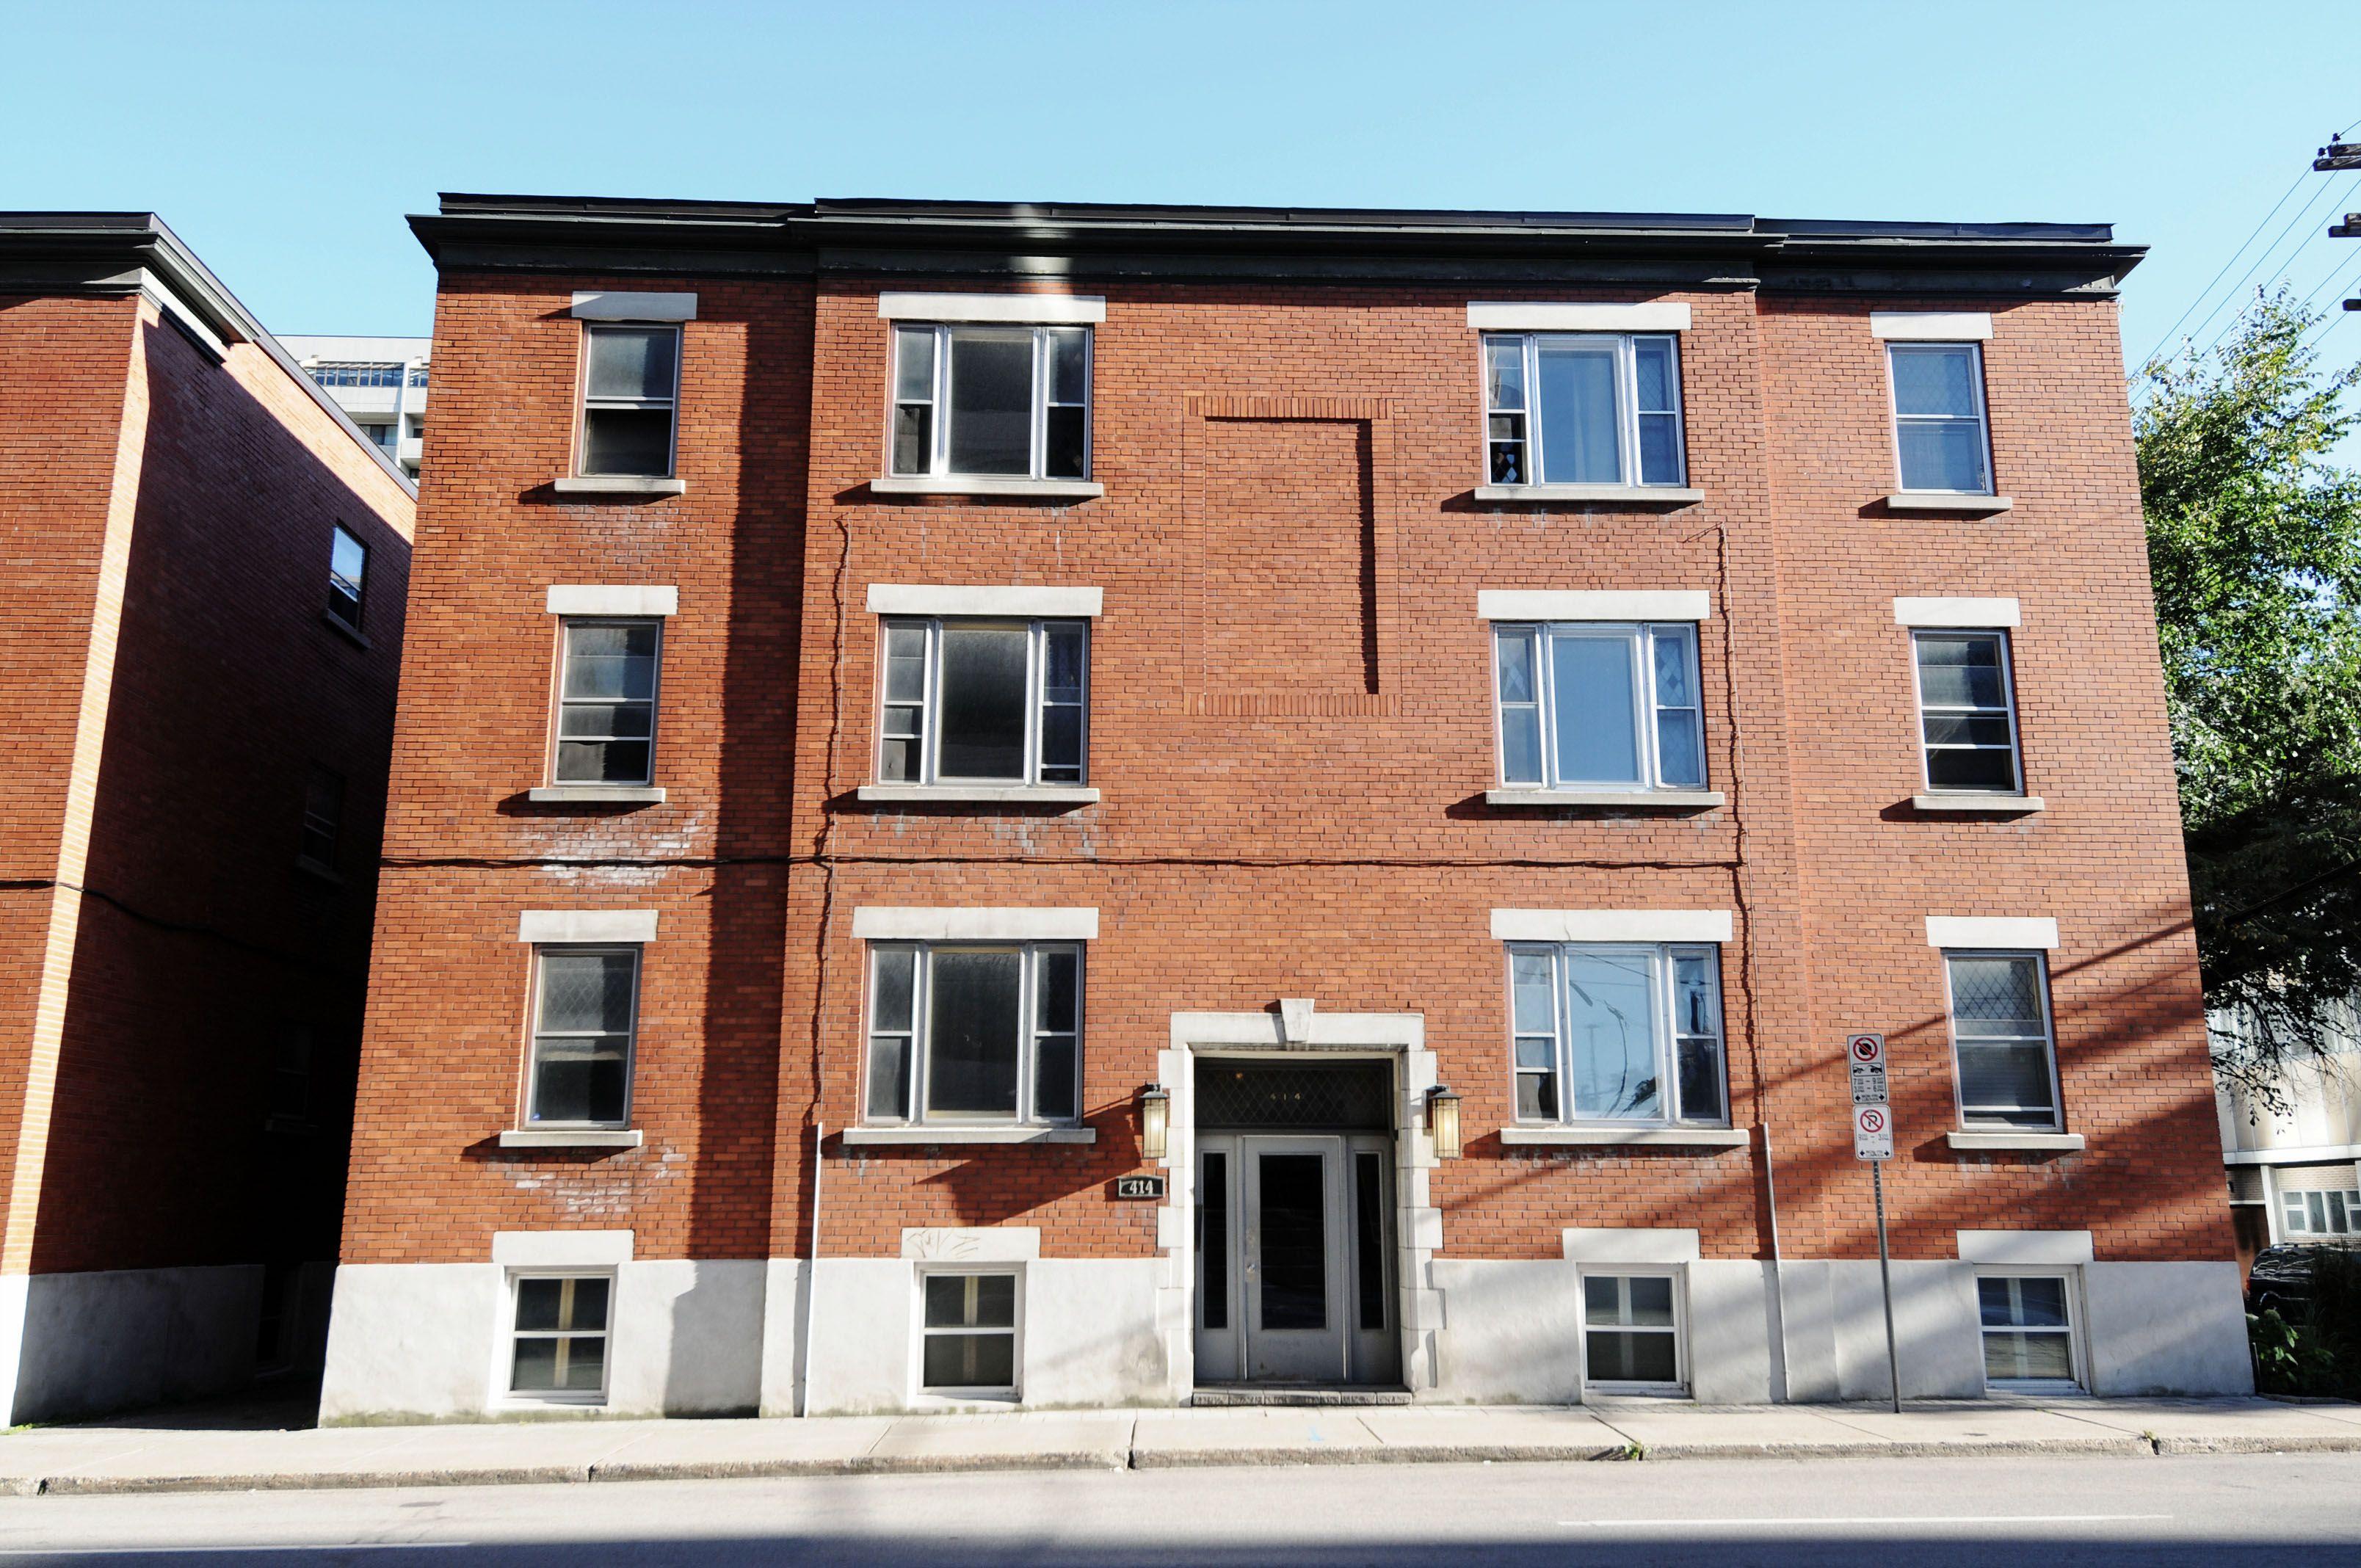 414 Albert St., Centretown, Ottawa